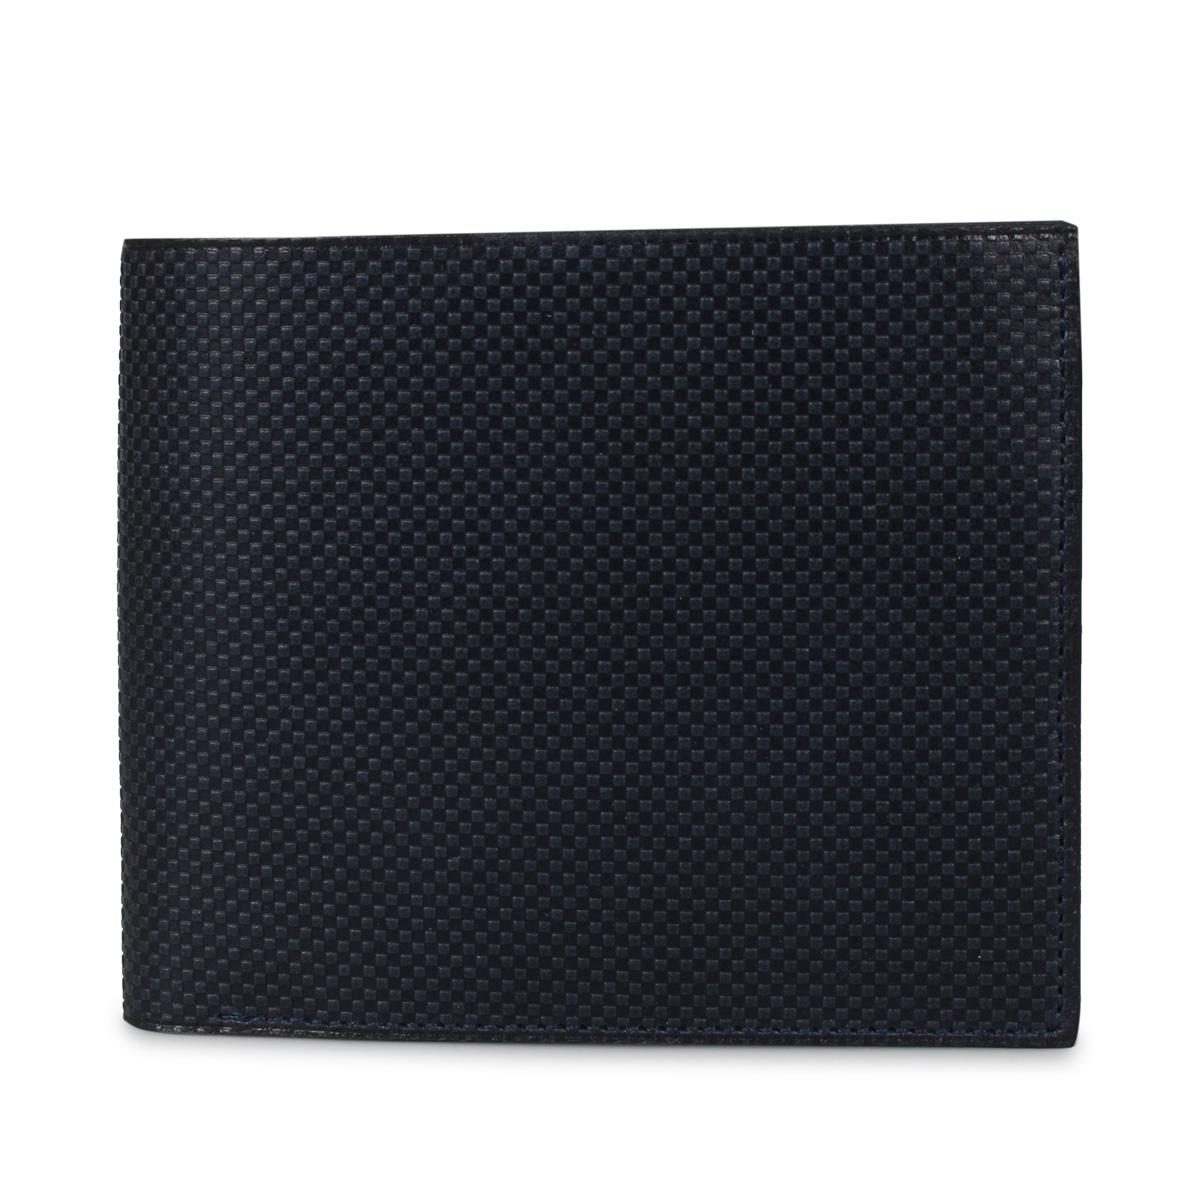 HIROAN CROISE ヒロアン 財布 二つ折り メンズ 博庵 ブラック ネイビー 黒 HM-80129